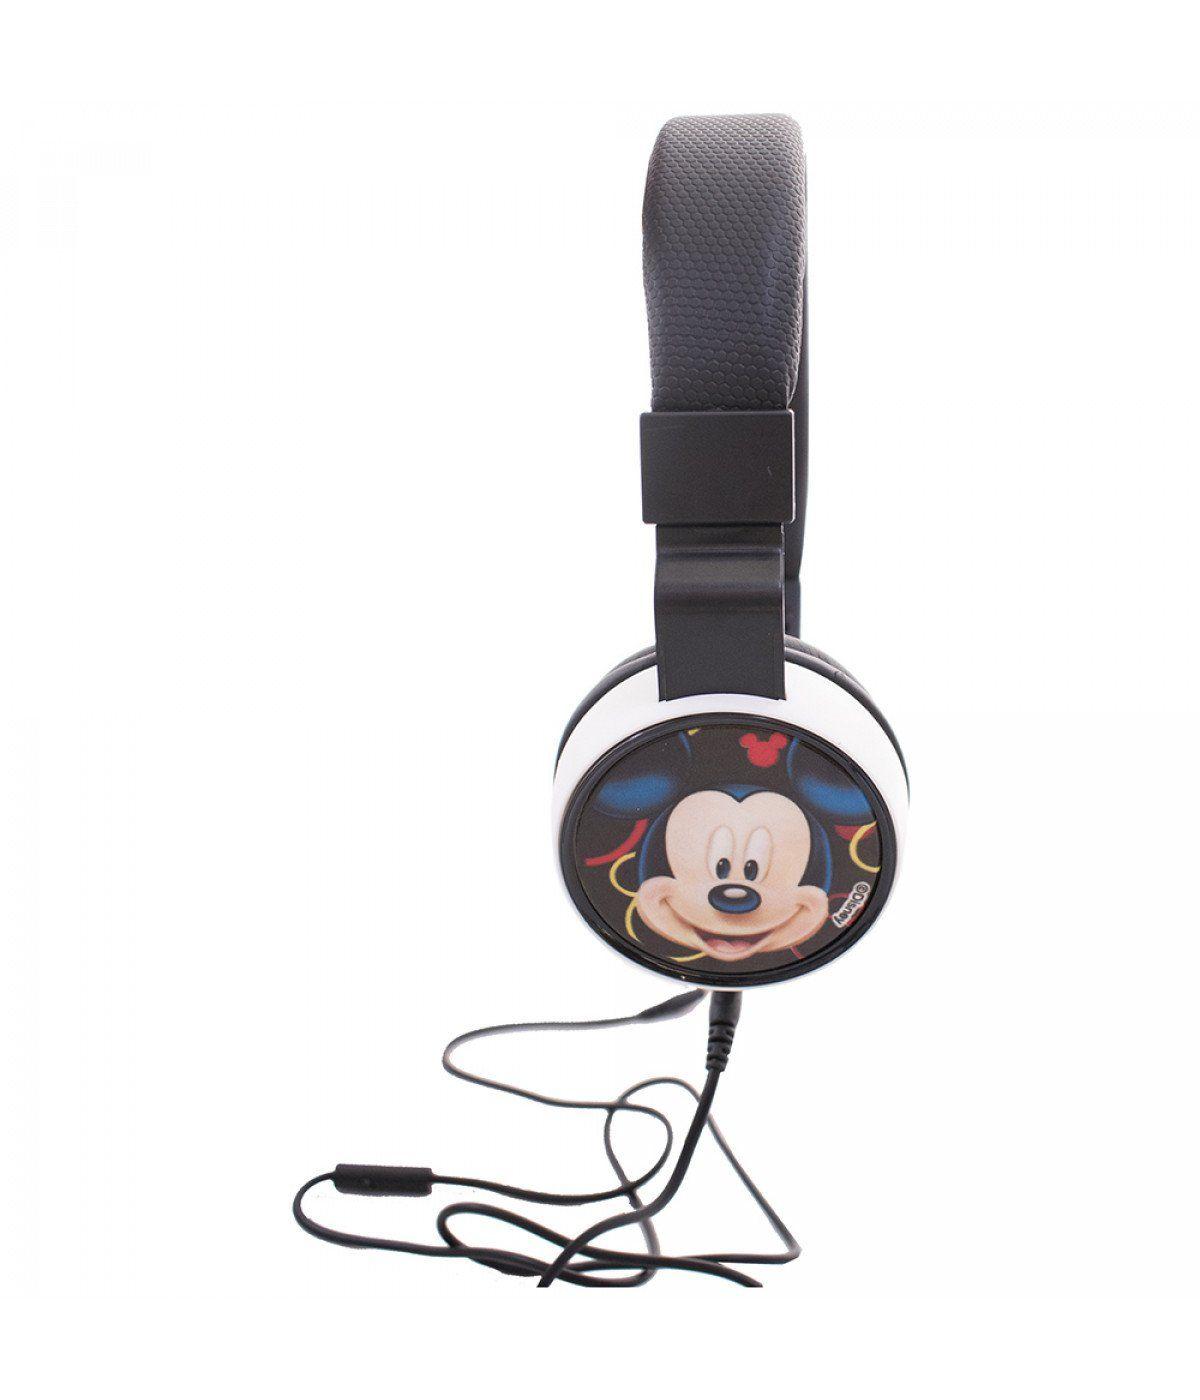 Fone de Ouvido Mickey Mouse: Disney